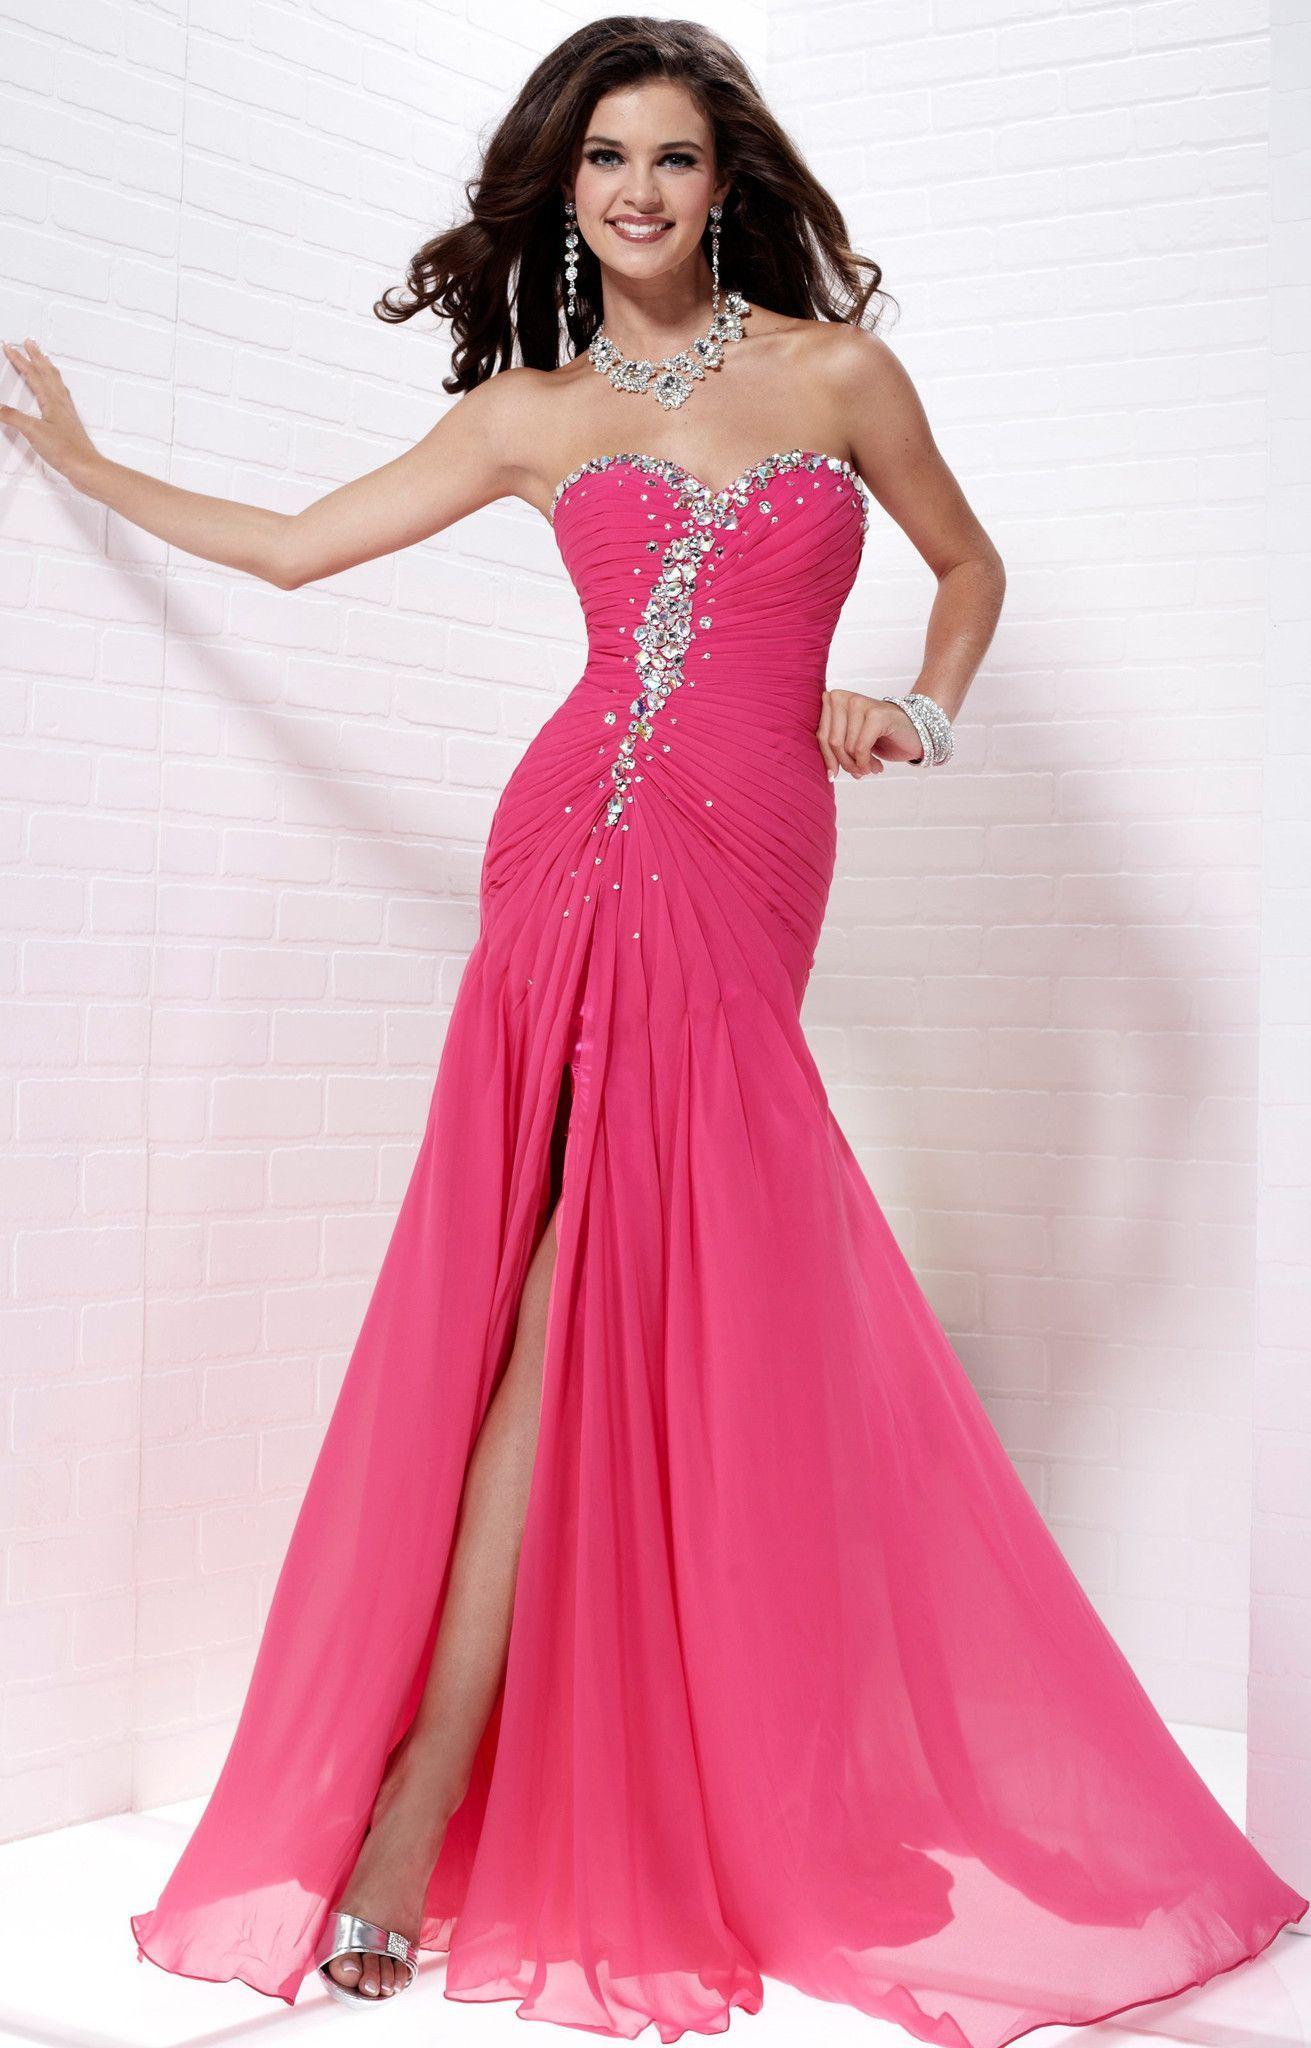 Tiffany 16674 Strapless Fuchsia Size 20 Prom Dress Evening Dress